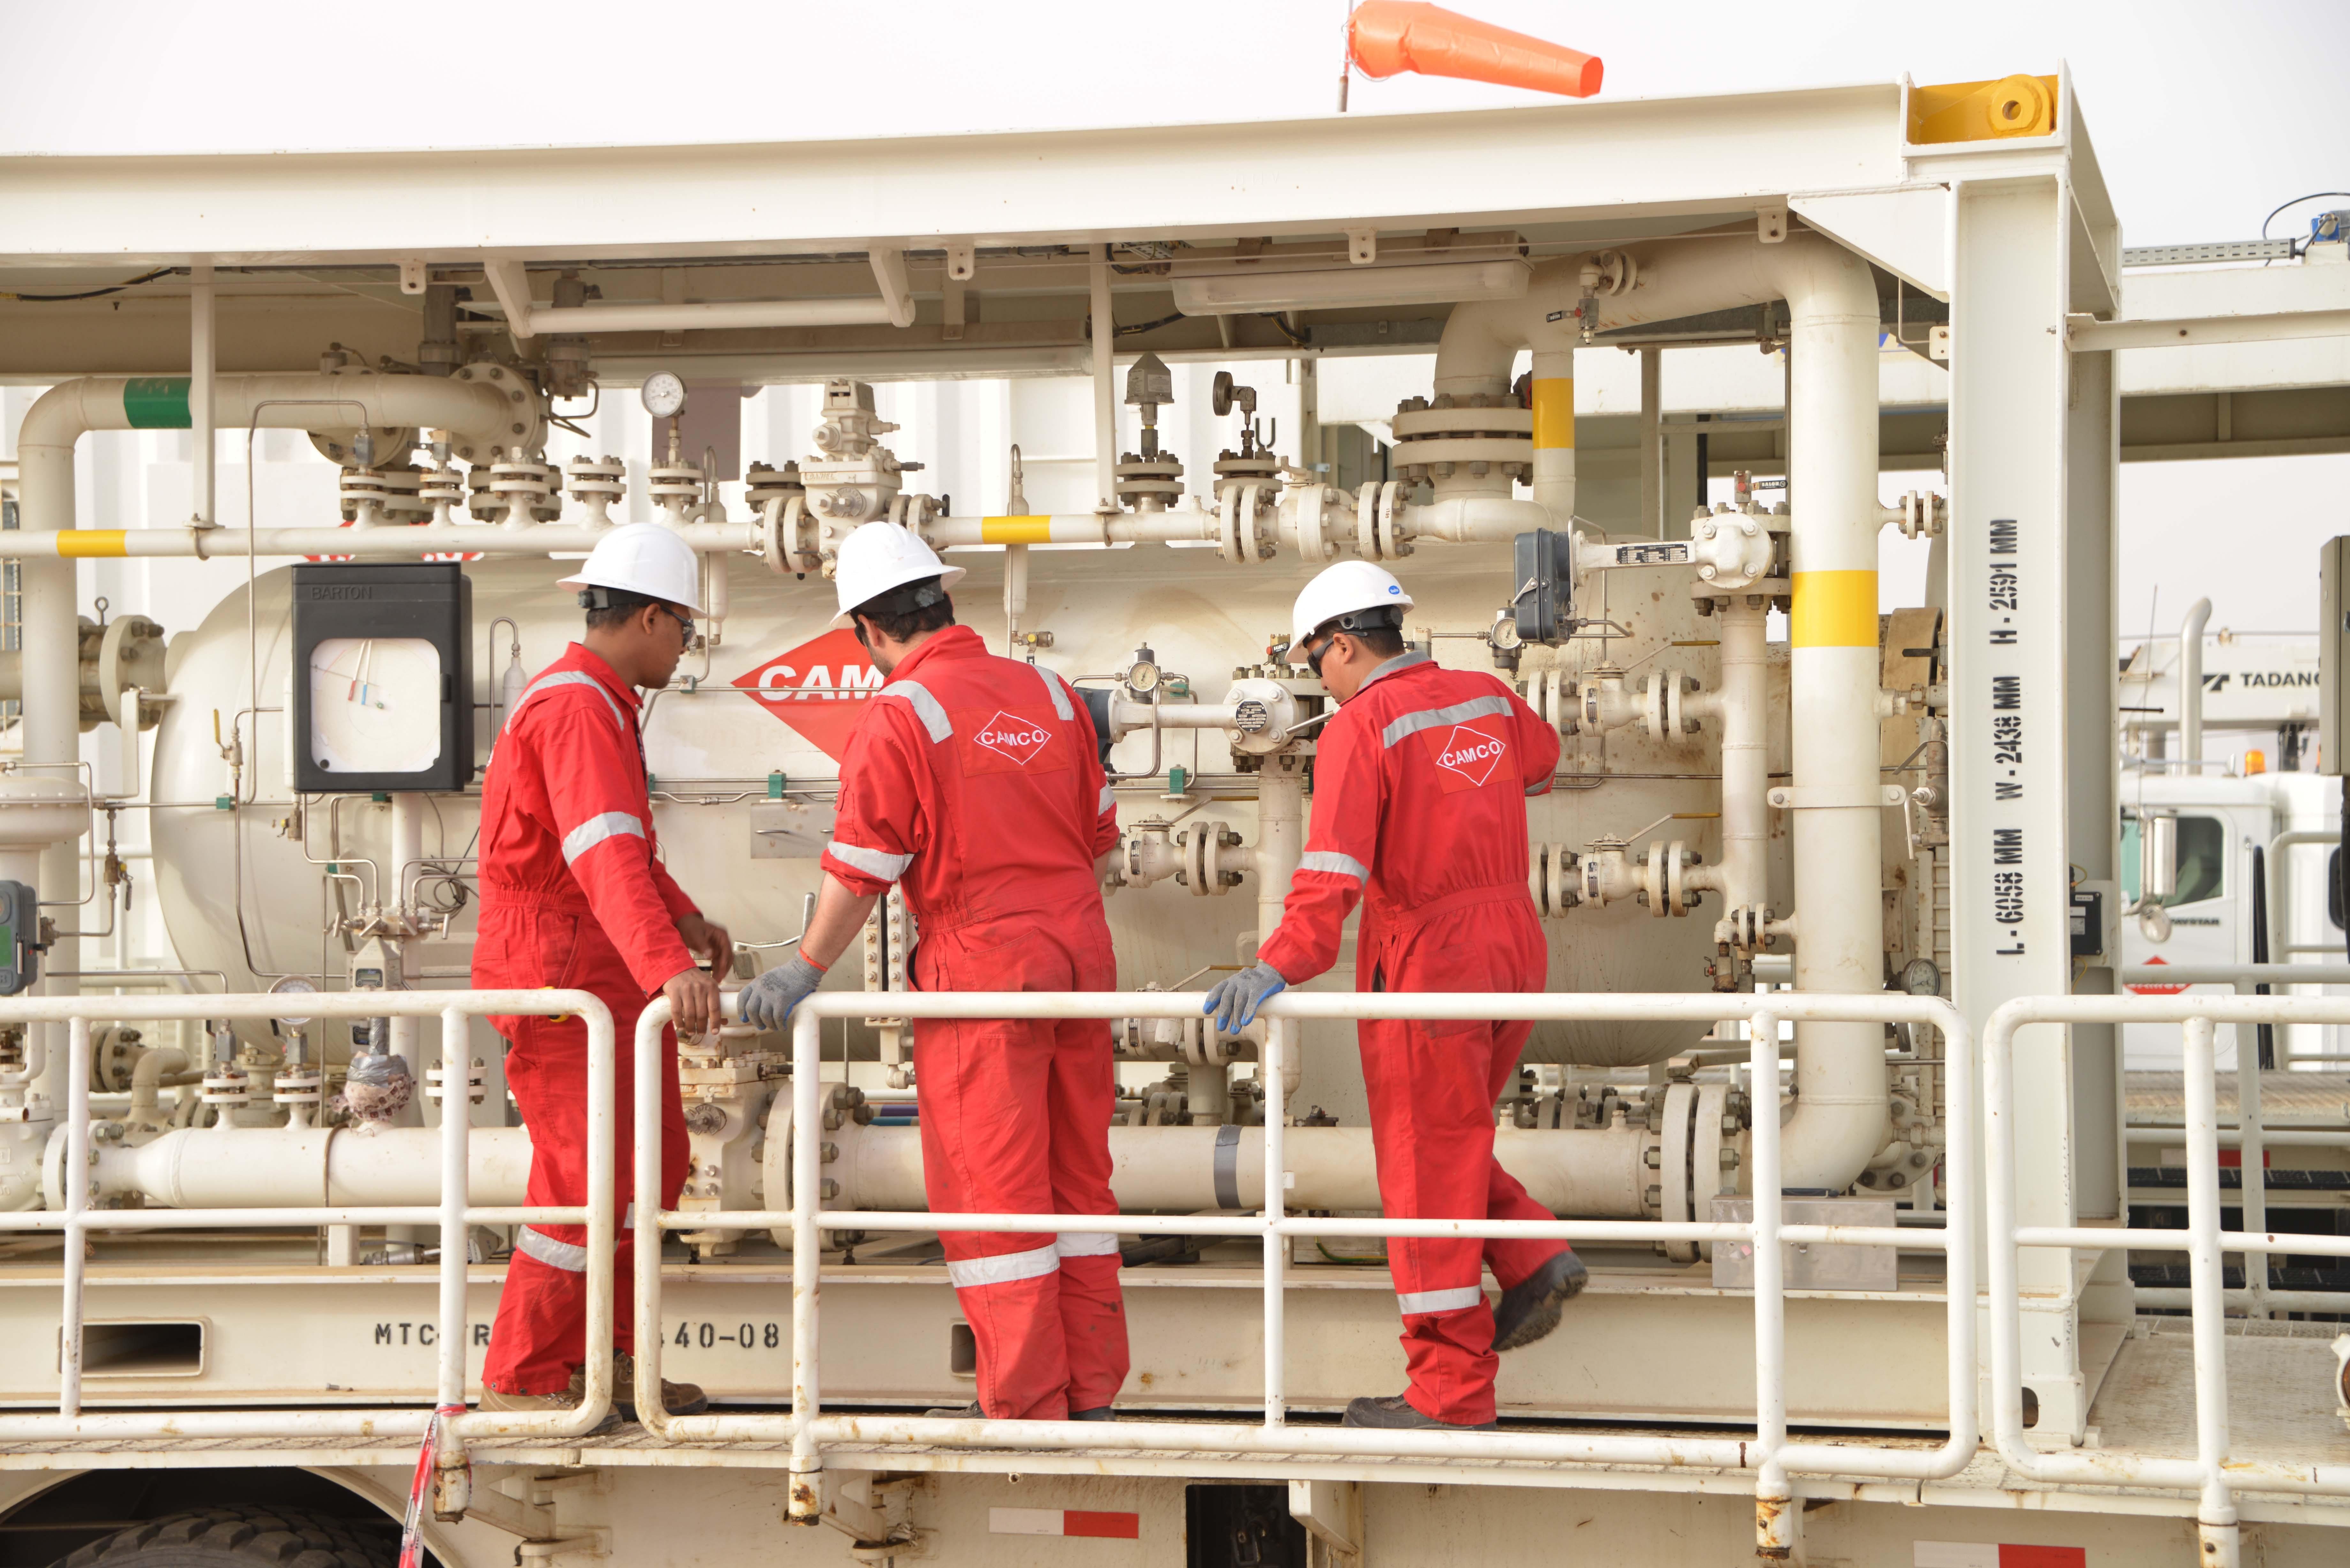 Camco Oilfield Services | LinkedIn